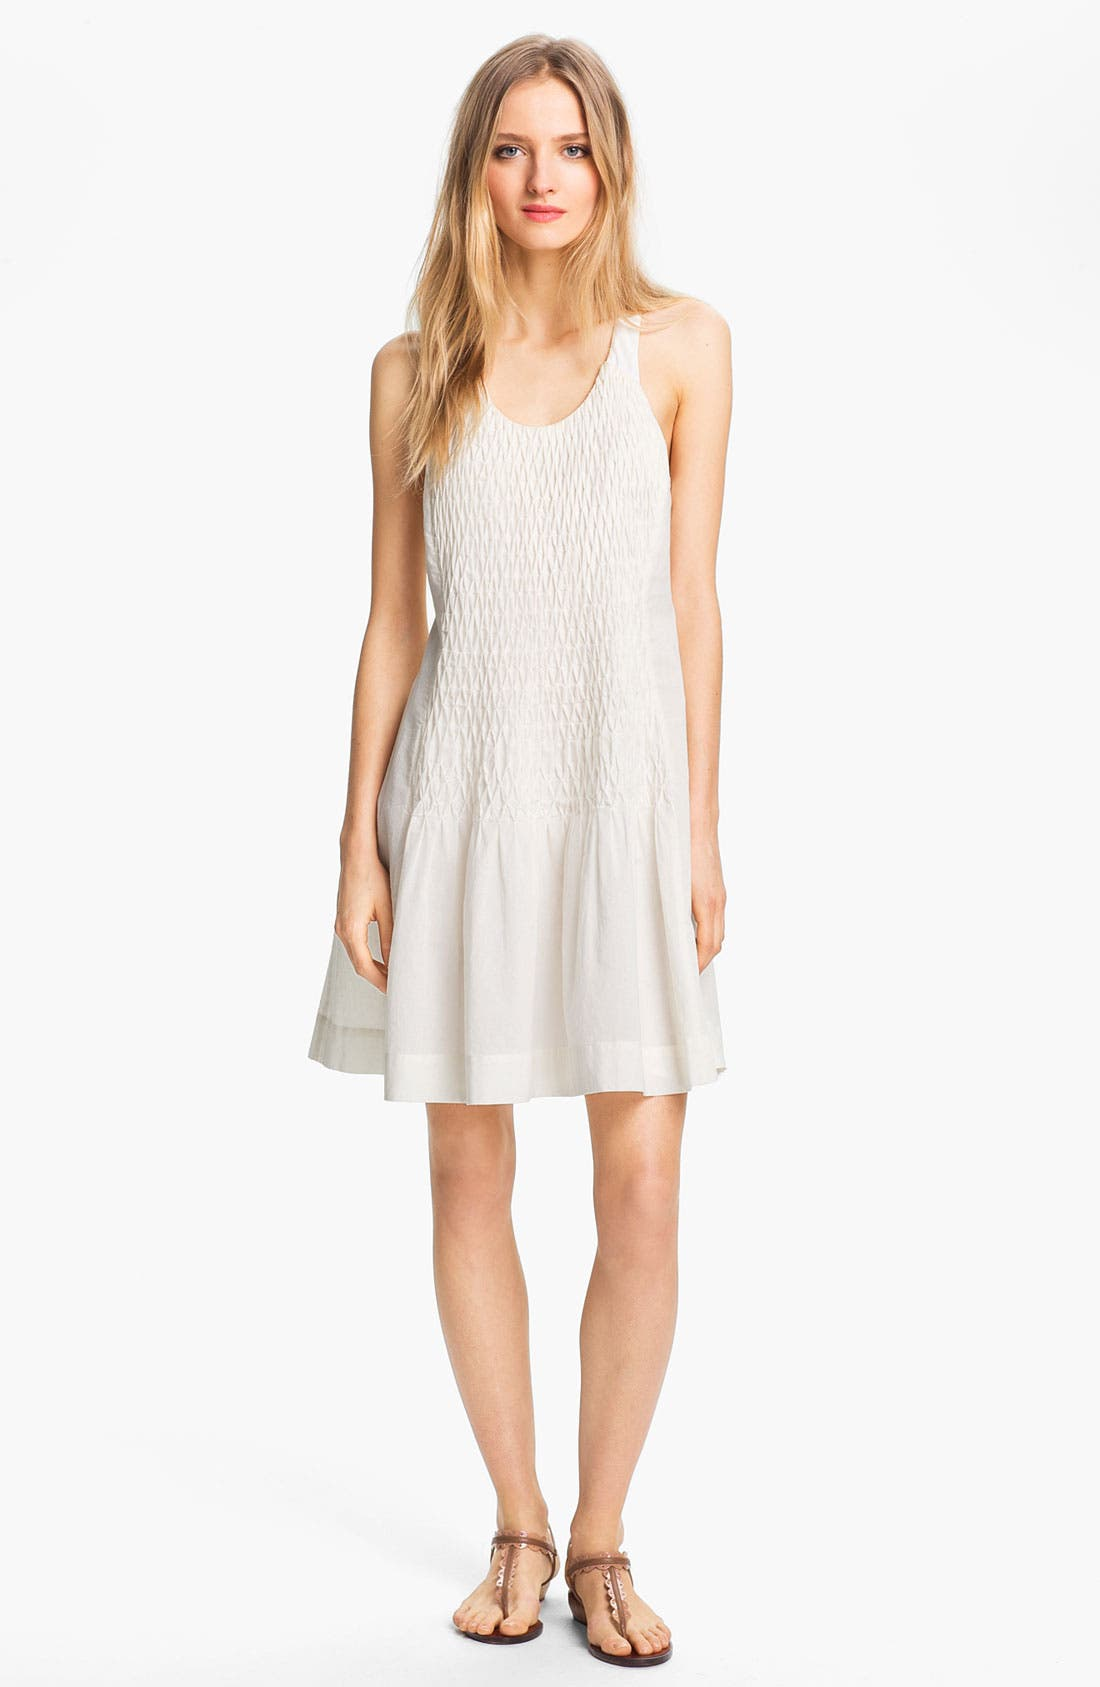 Alternate Image 1 Selected - rag & bone 'Ivette' Racerback Dress